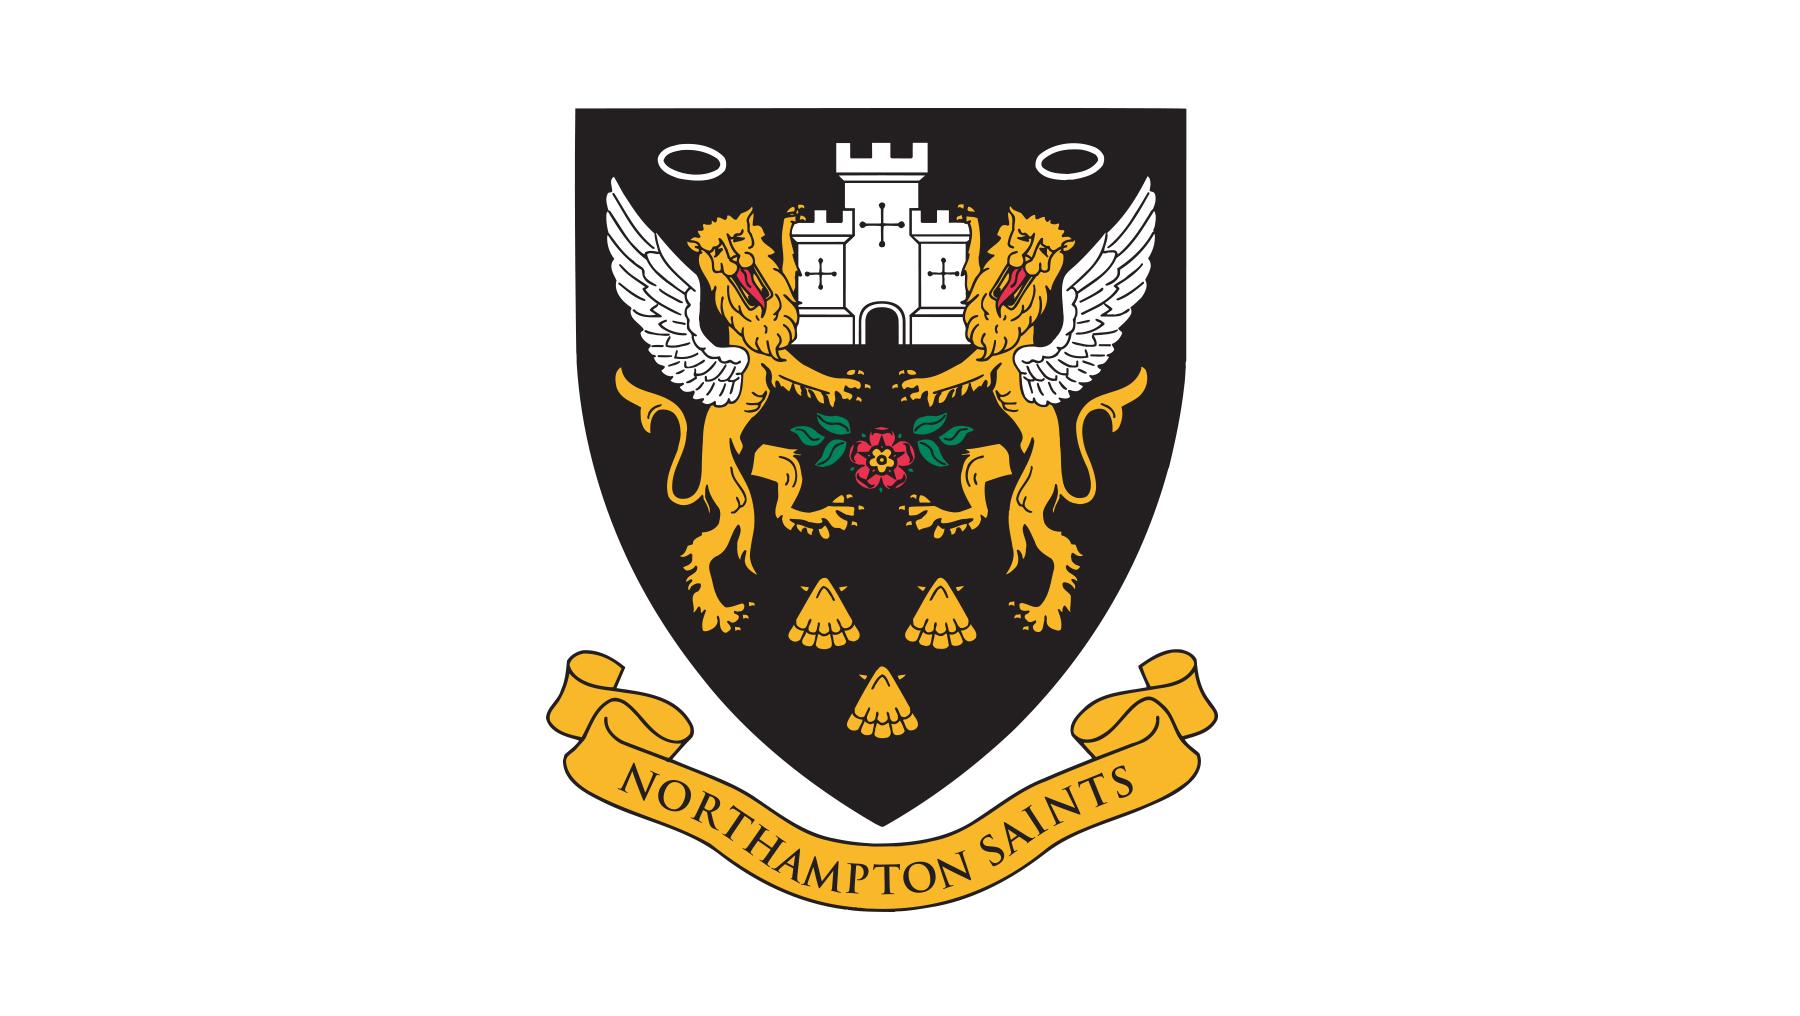 25% off Harlequins v Northampton Saints on Friday 2nd February